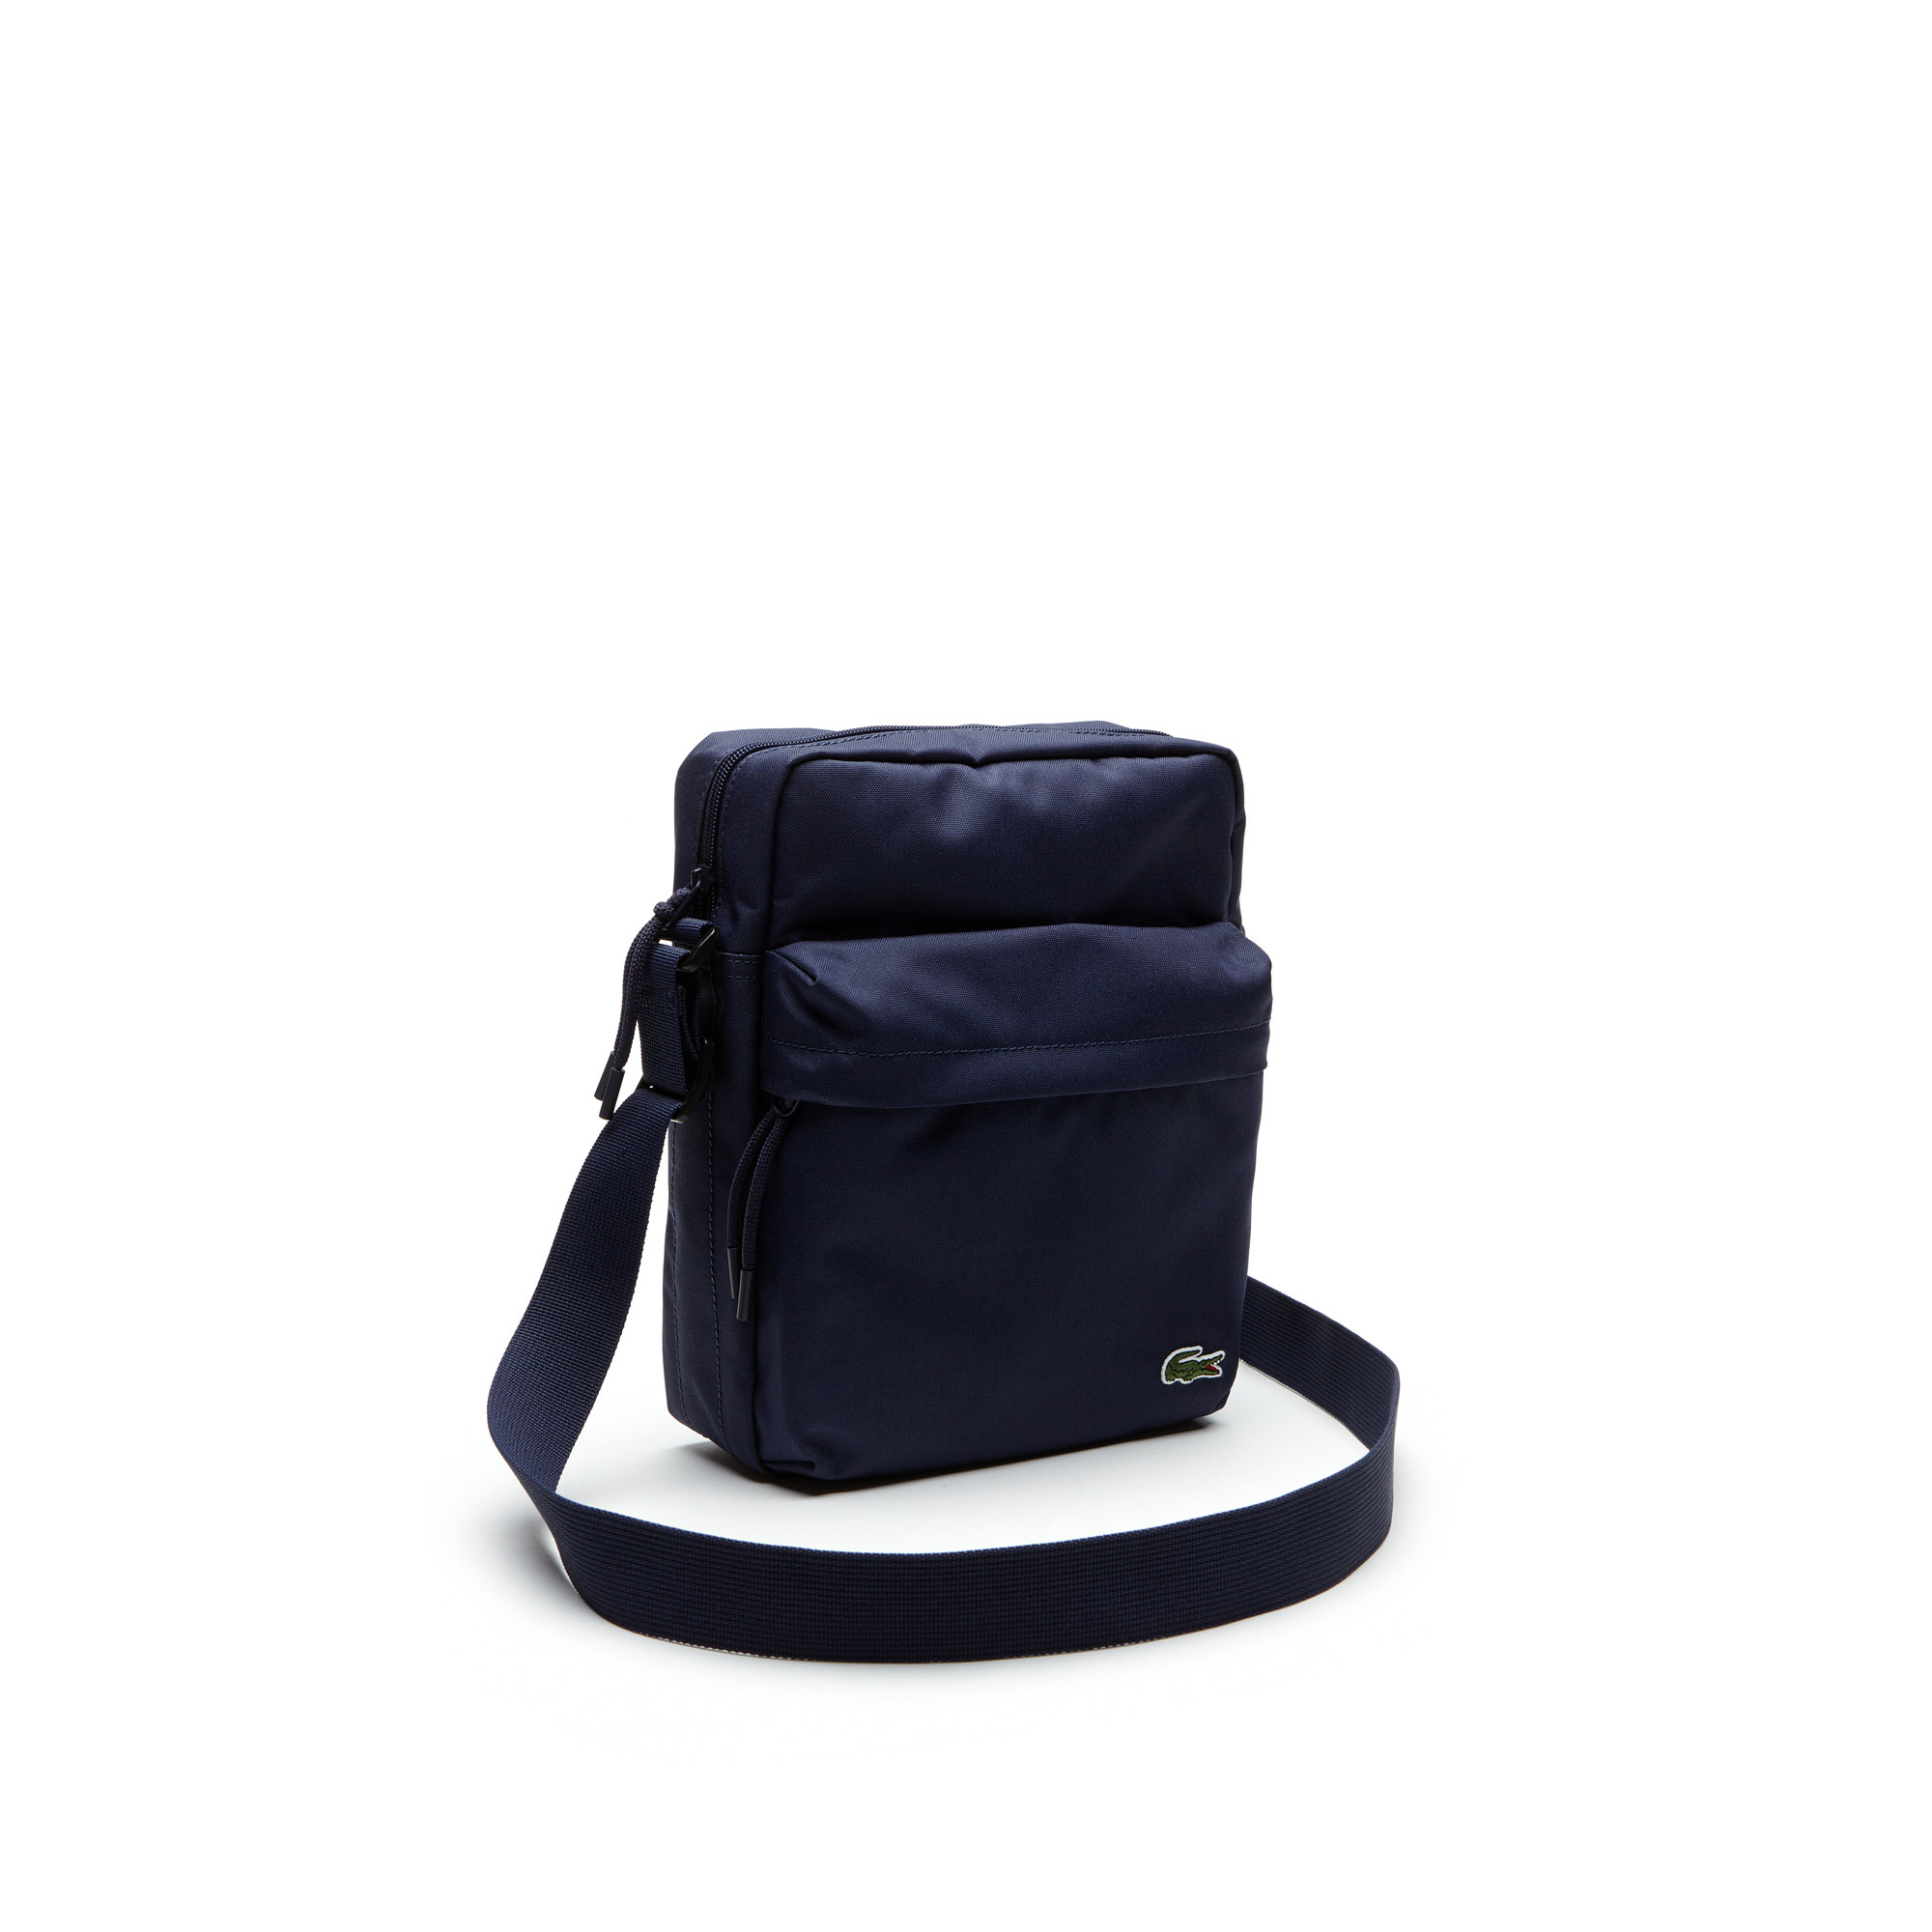 Lacoste Men's Neocroc Canvas Zip Bag